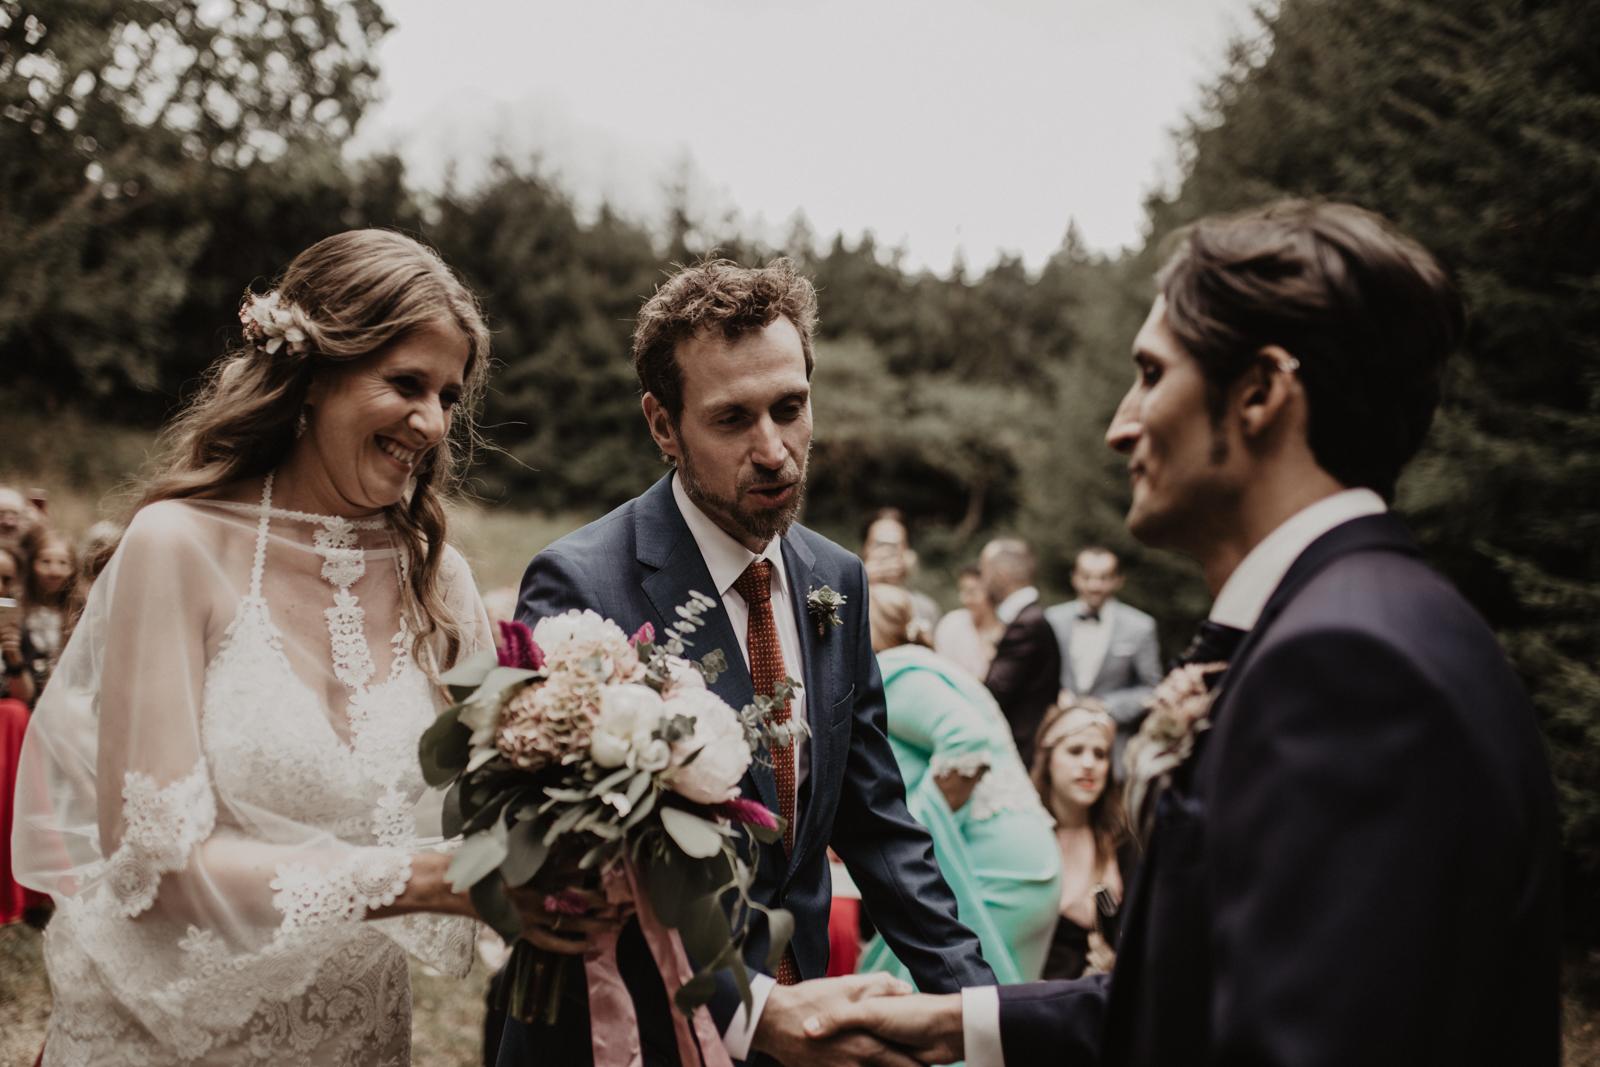 thenortherngirlphotography_photography_thenortherngirl_rebeccascabros_wedding_weddingphotography_weddingphotographer_barcelona_bodaenbarcelona_bodaenmaselmarti_bodarogeryvane-363.jpg